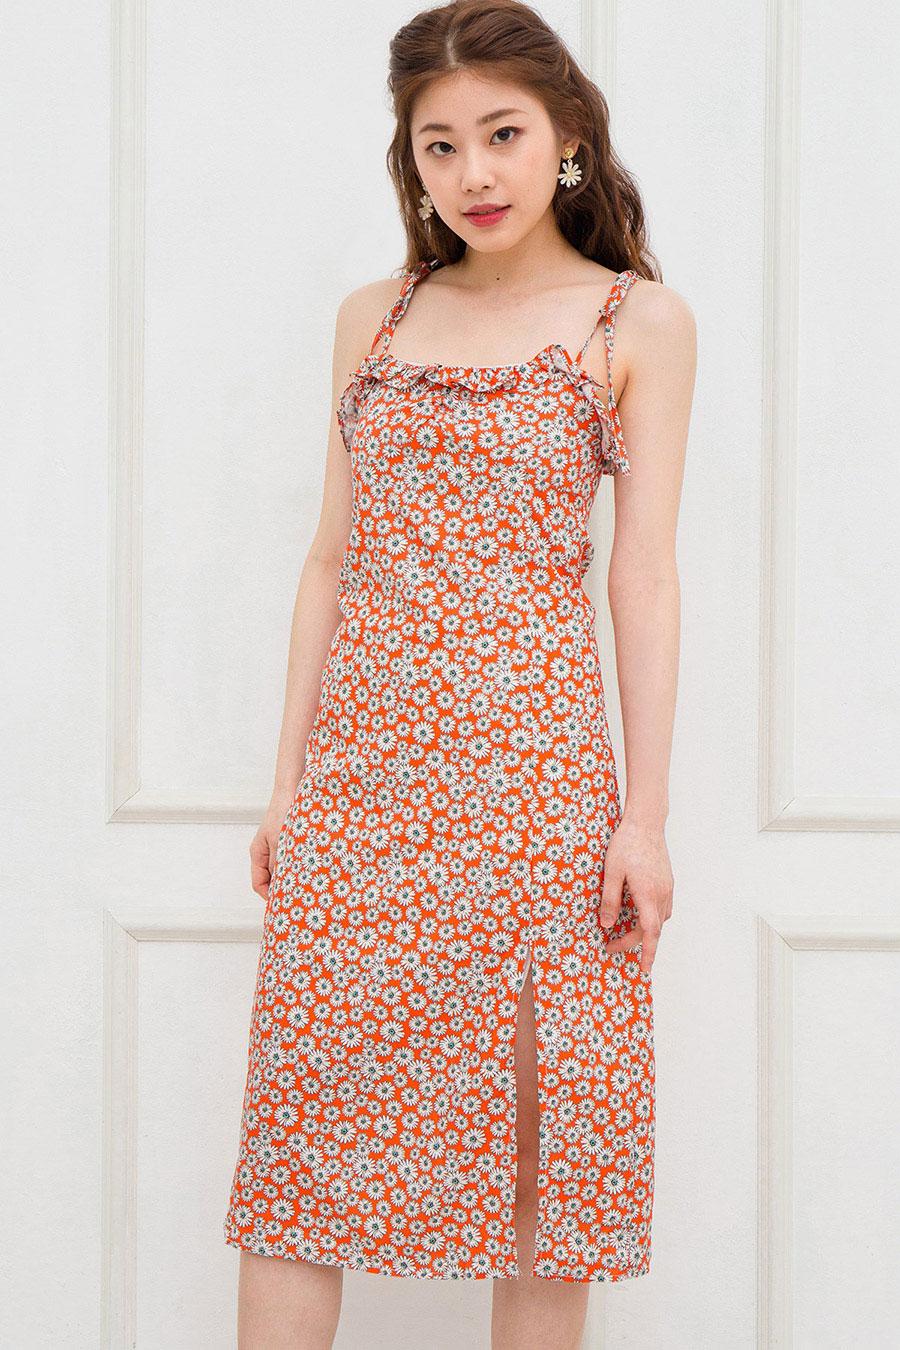 GRETA DRESS - TANGERINE FLEUR